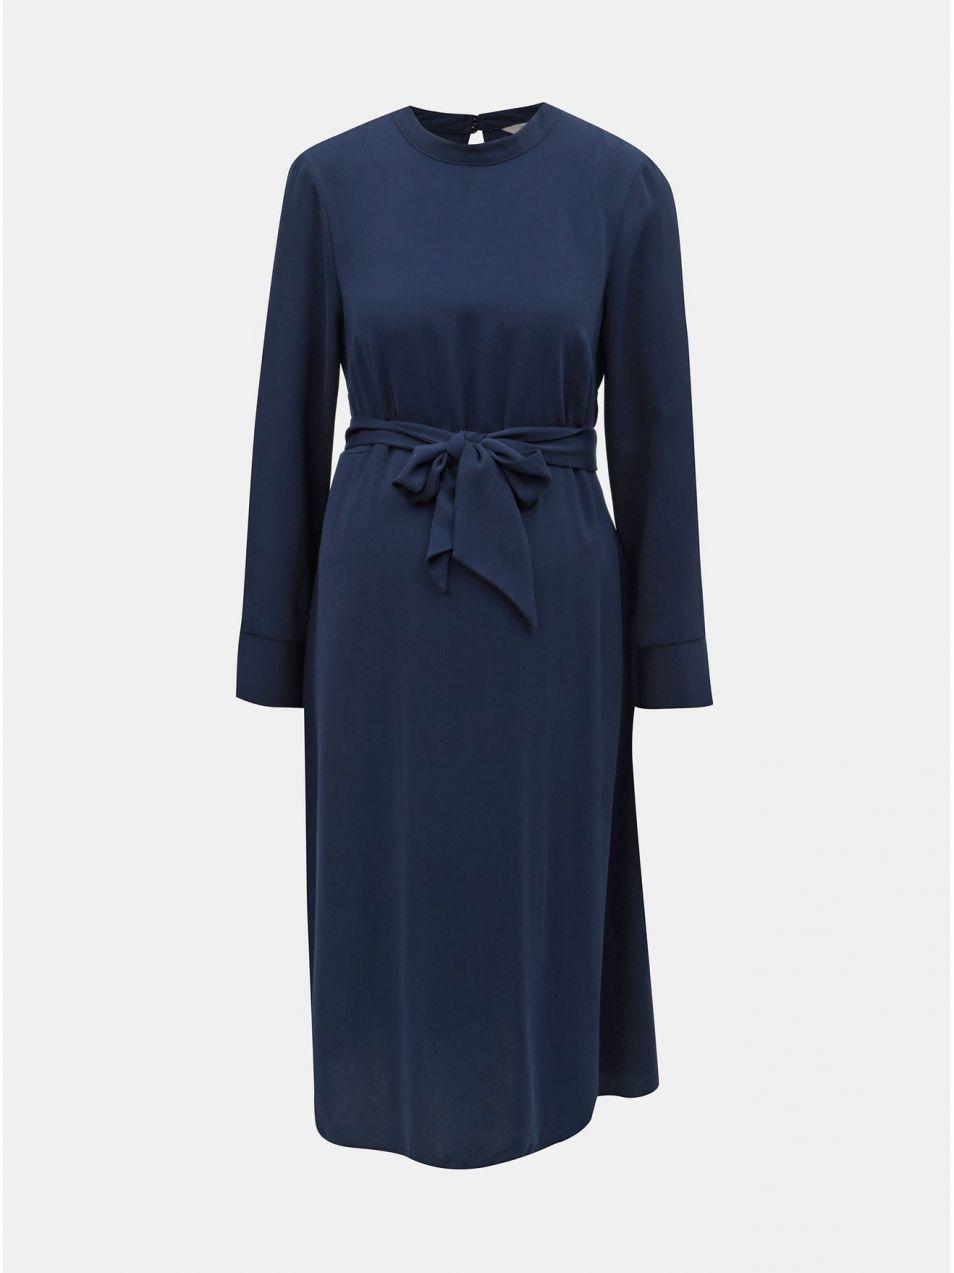 9fa549f913bf Tmavomodré tehotenské šaty Dorothy Perkins Maternity značky Dorothy ...